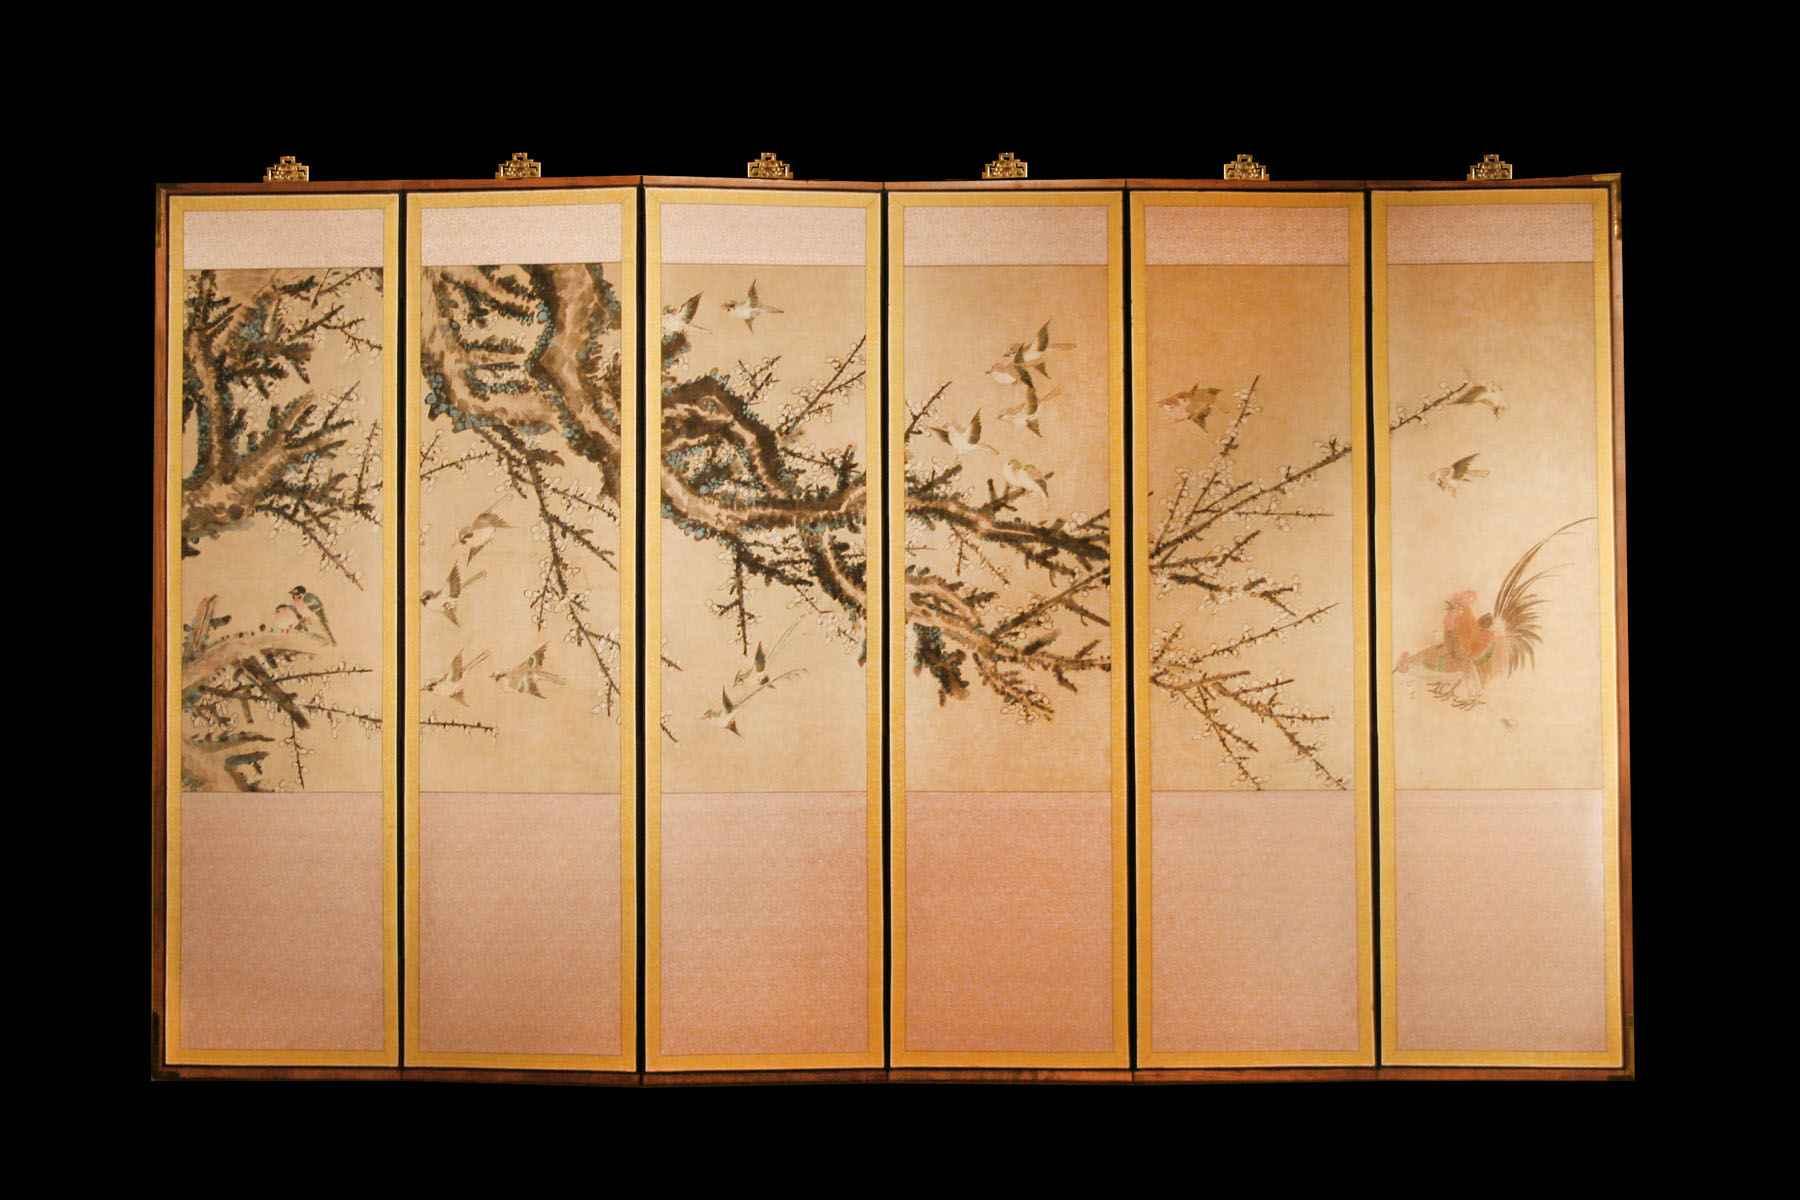 Decorative Room Screens Divider Ideas